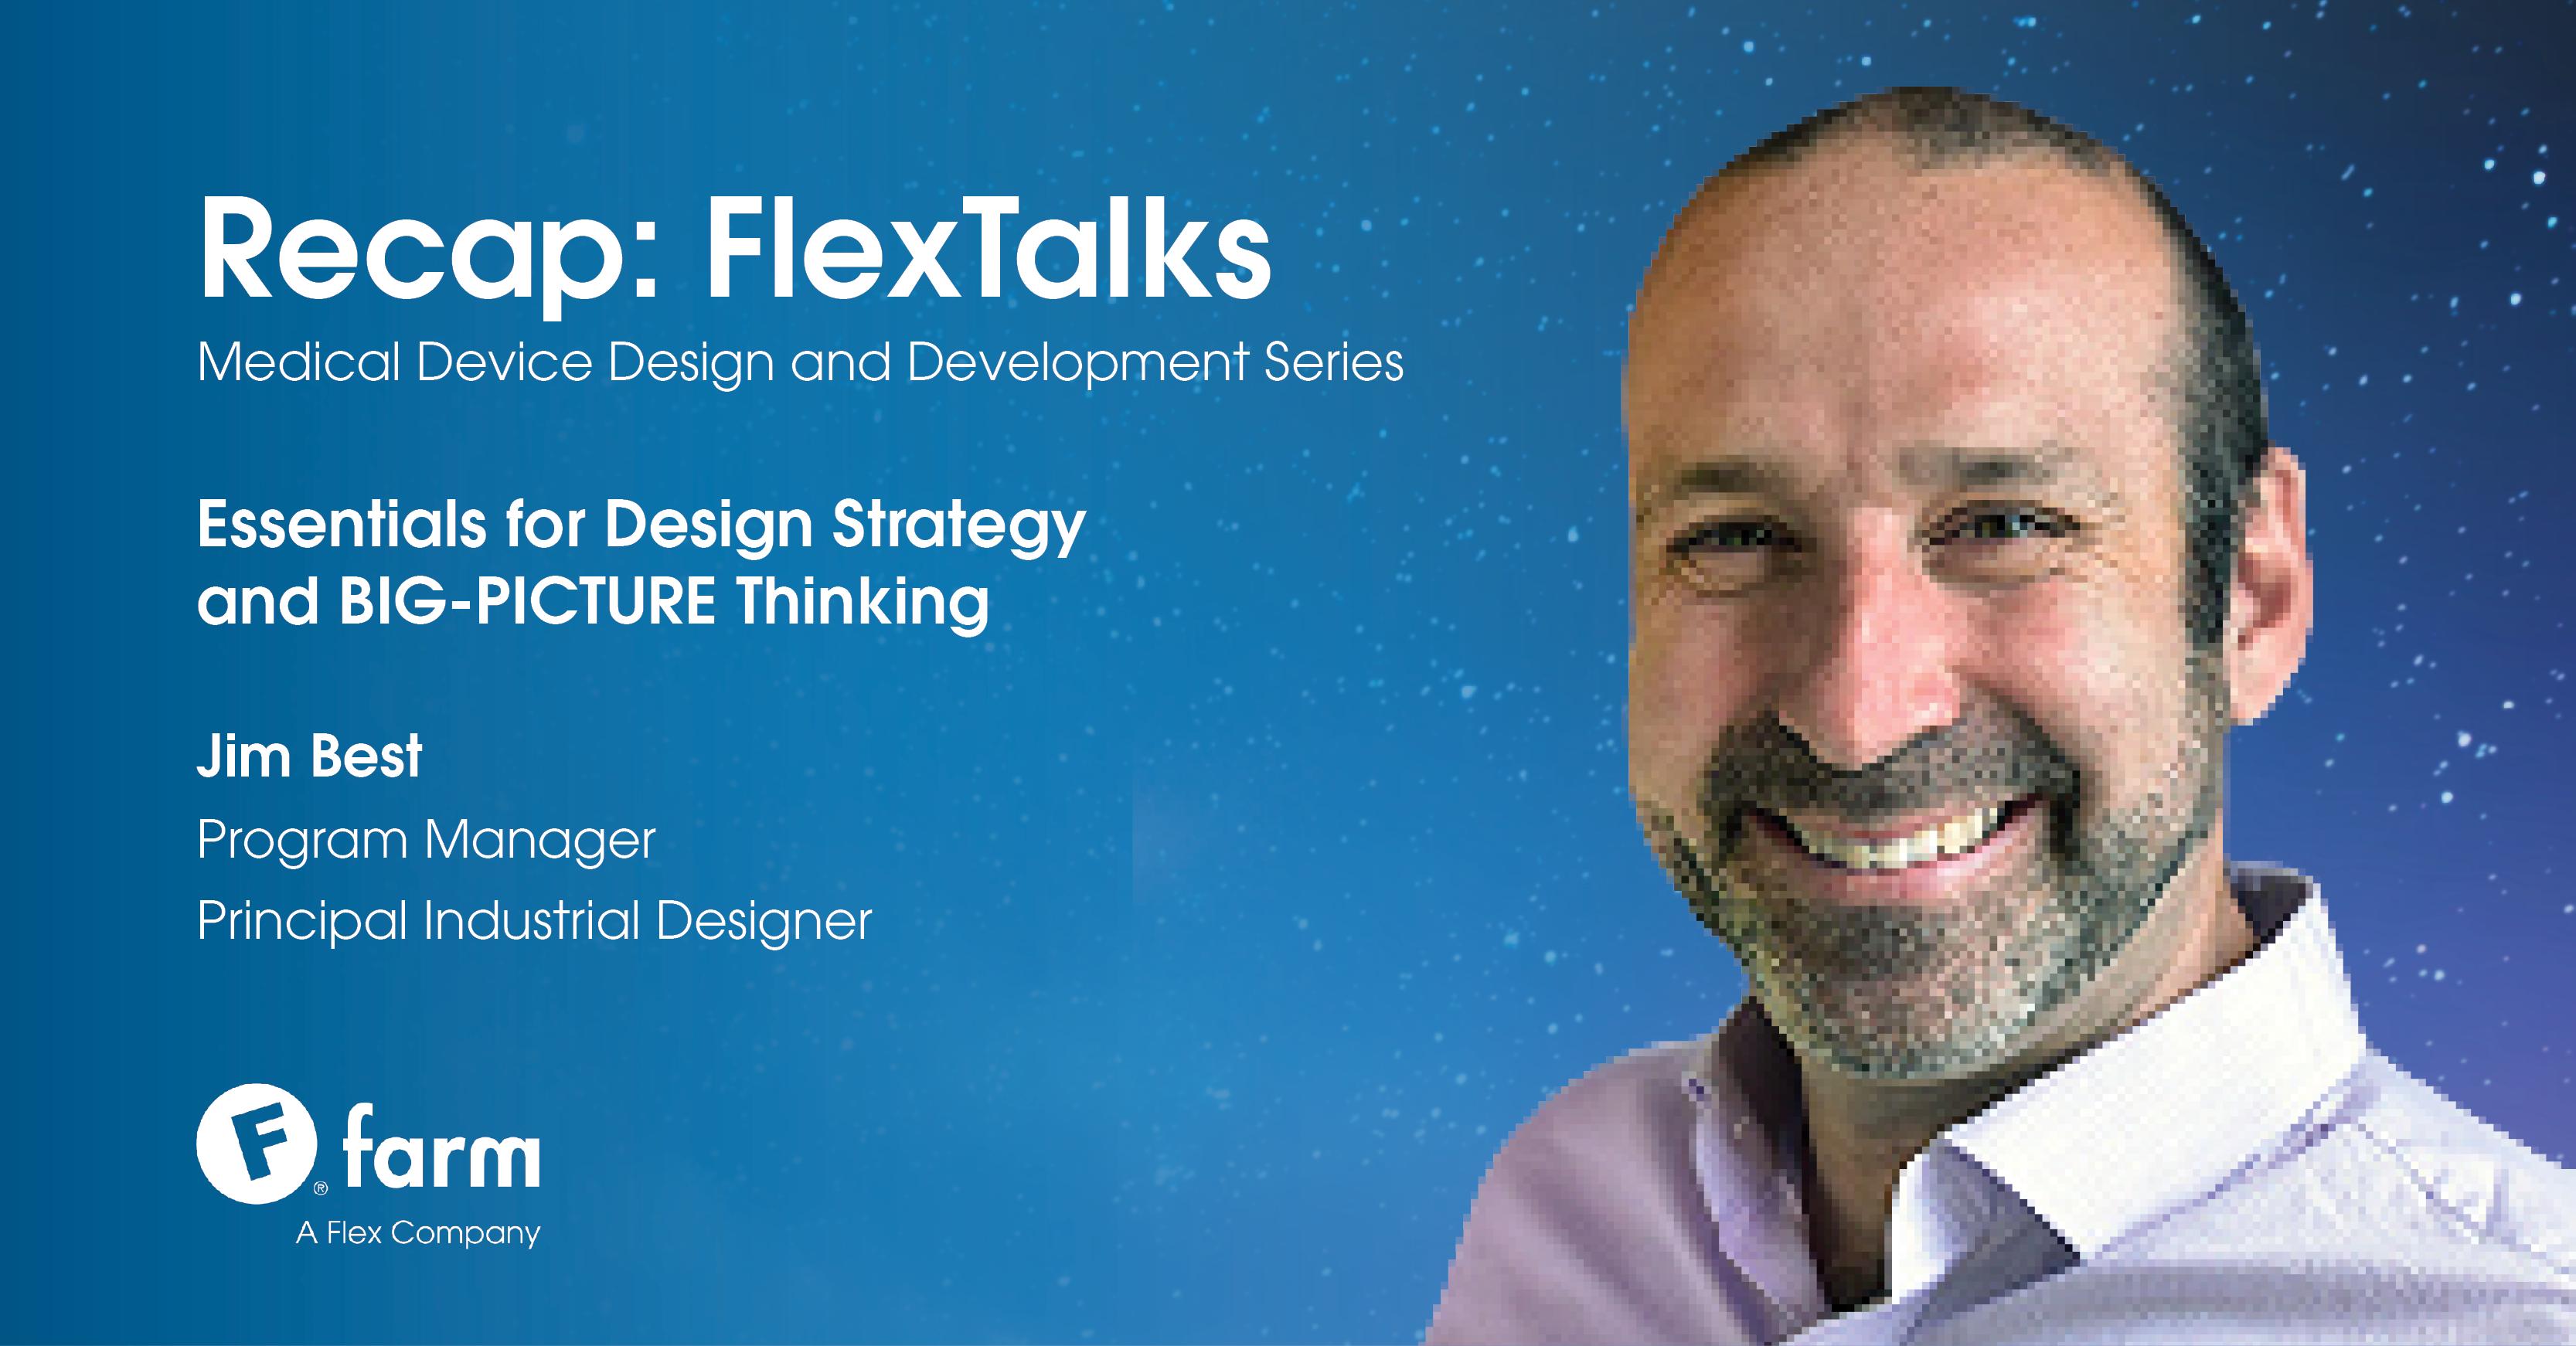 Flex Talks Recap: Essentials for Design Strategy and BIG PICTURE Thinking